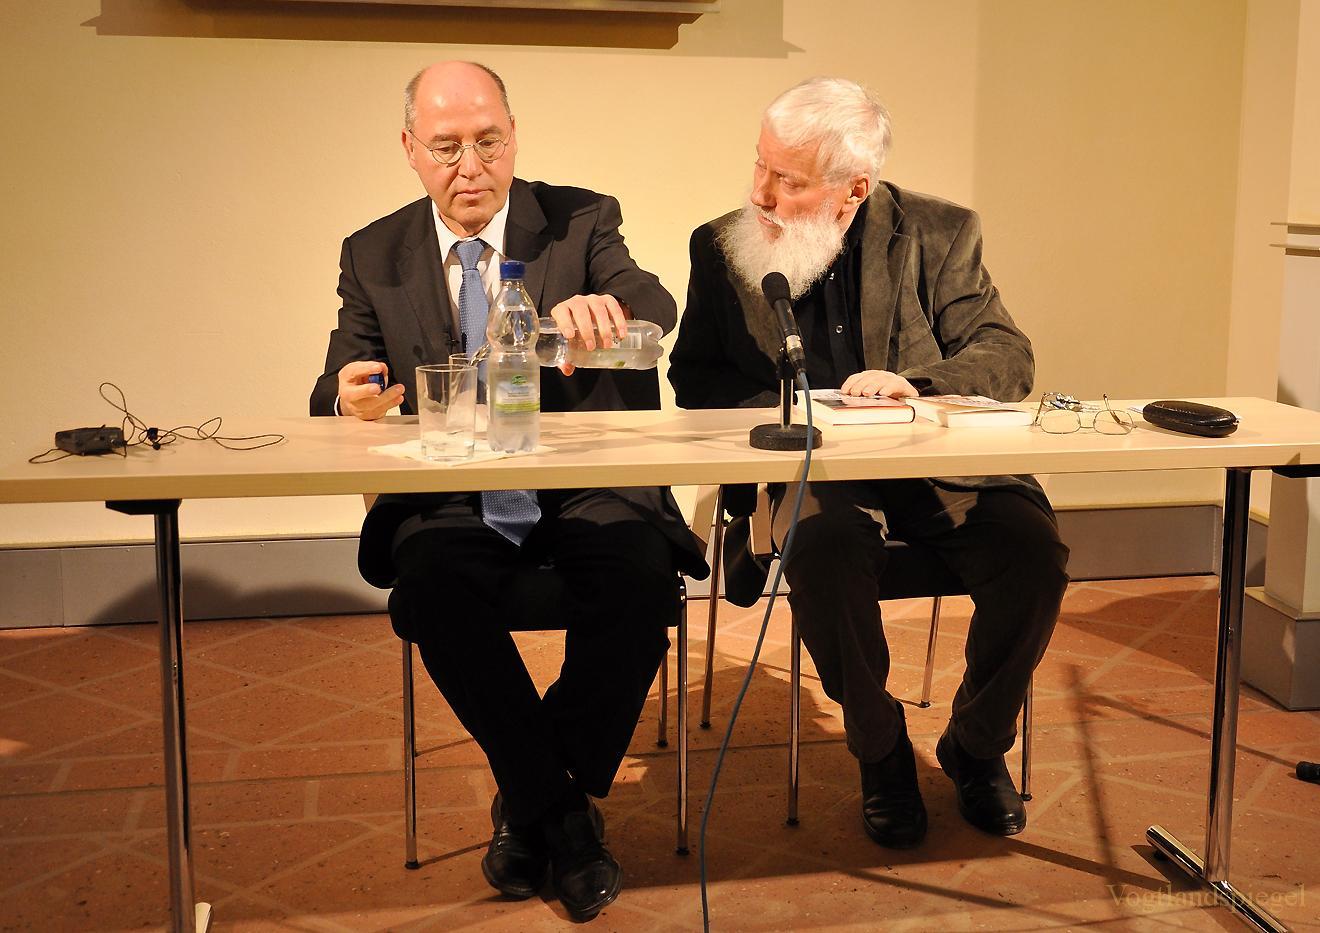 Gregor Gysi bei »Prominente im Gespräch« auf dem Oberen Schloss Greiz